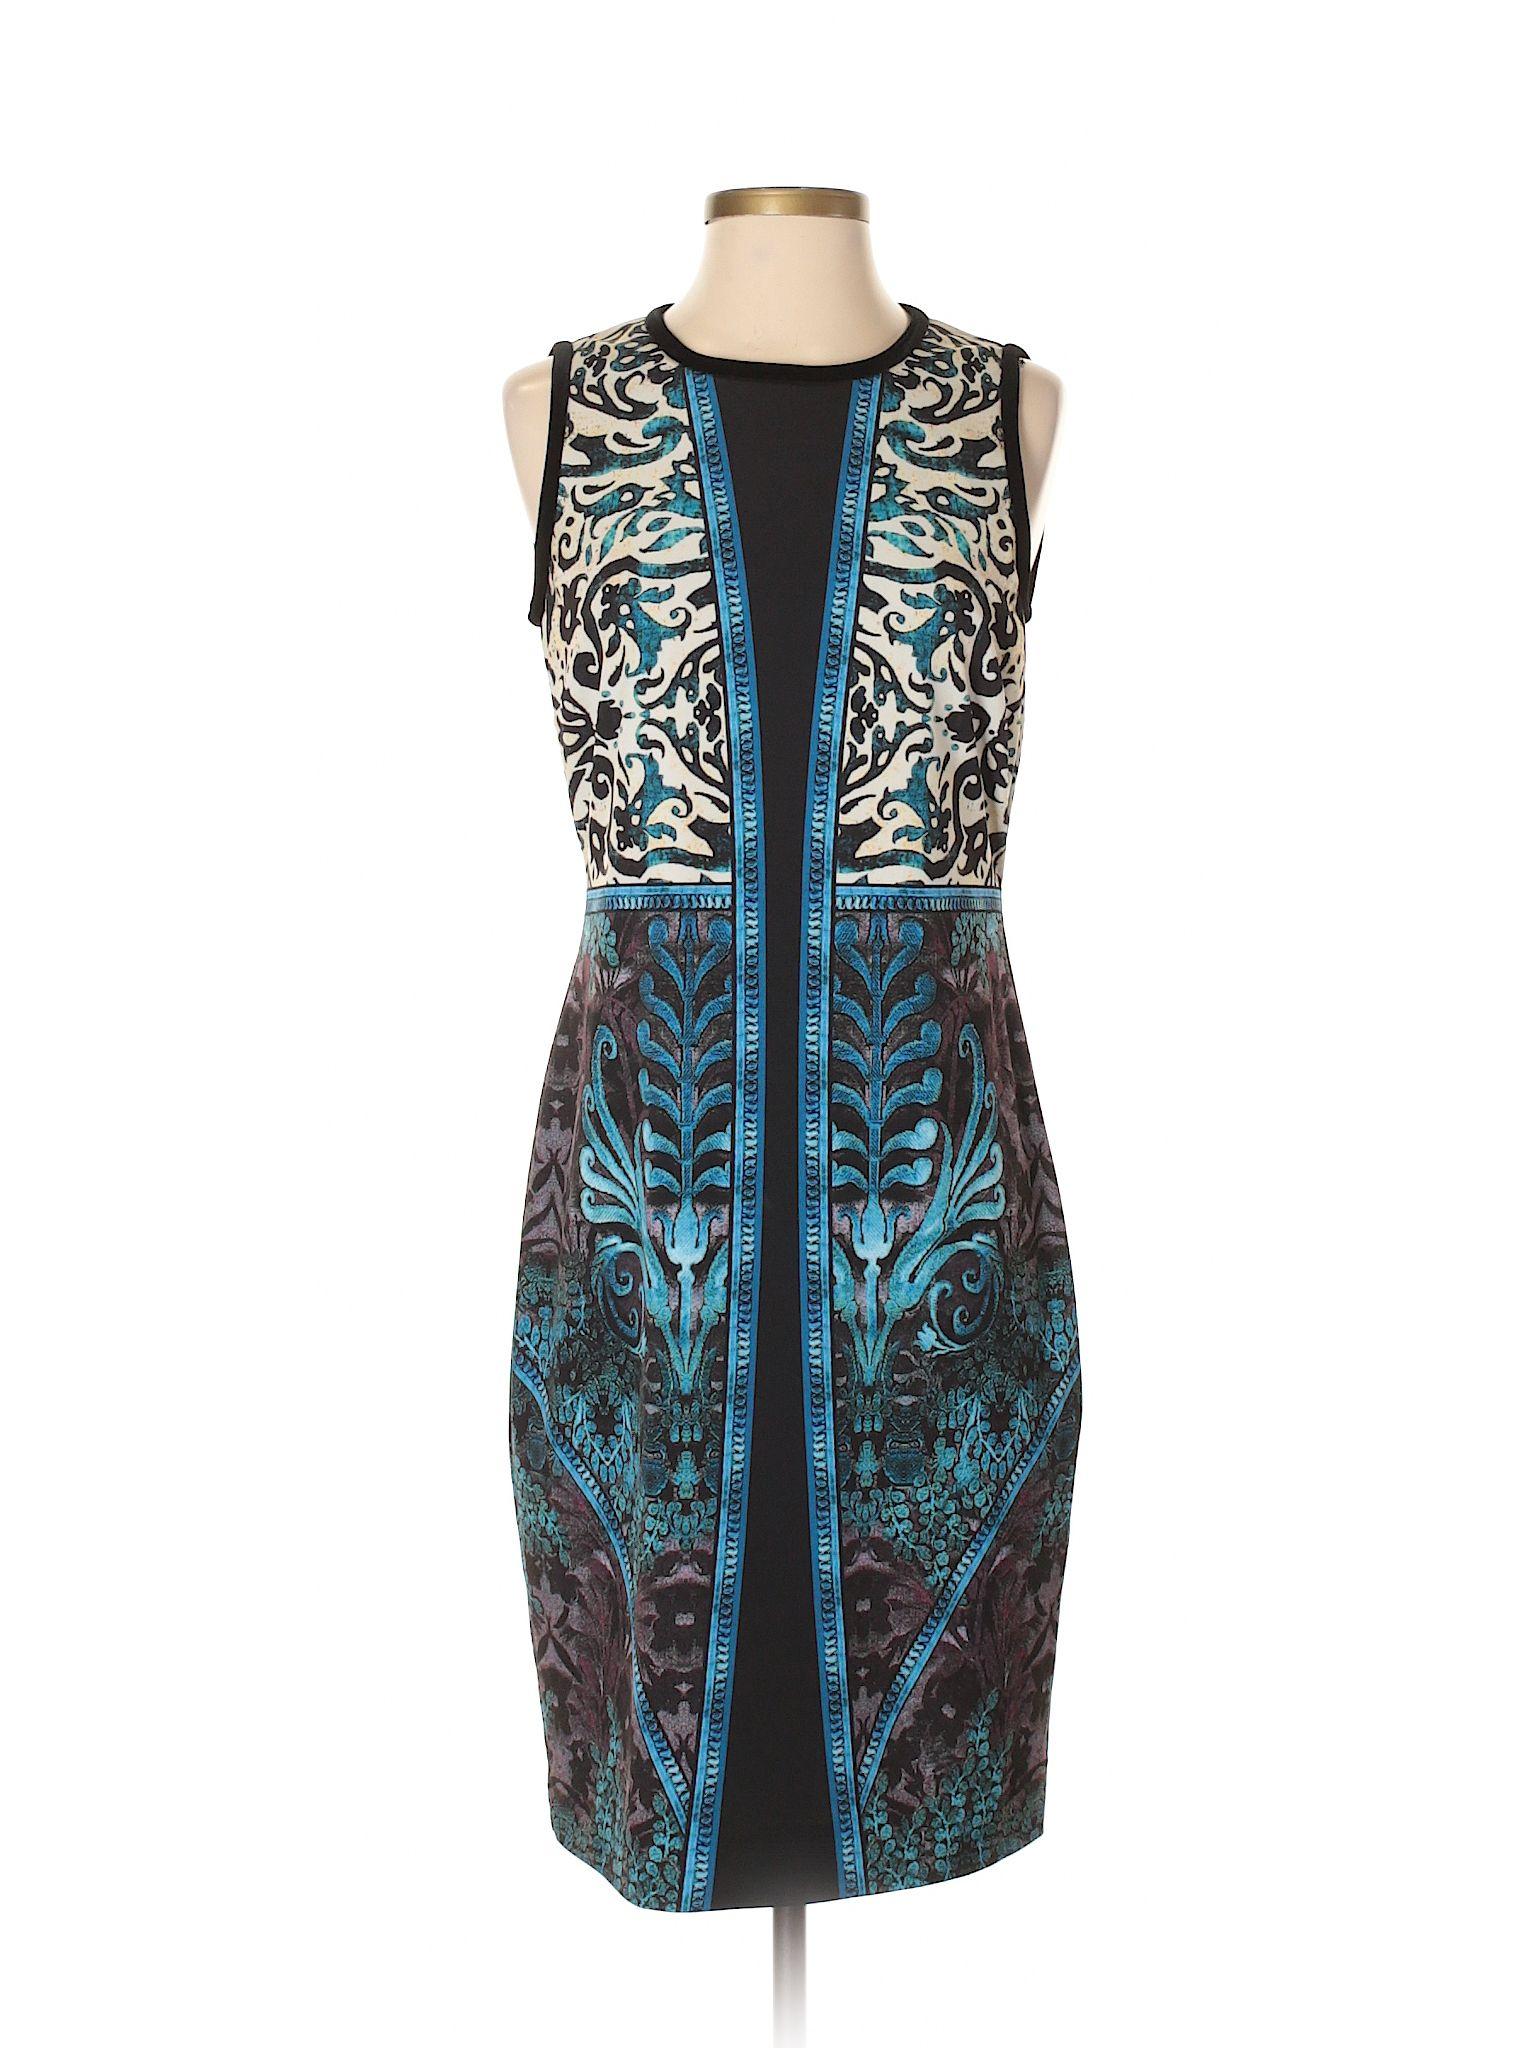 Etcetera casual dress size blue womenus dresses